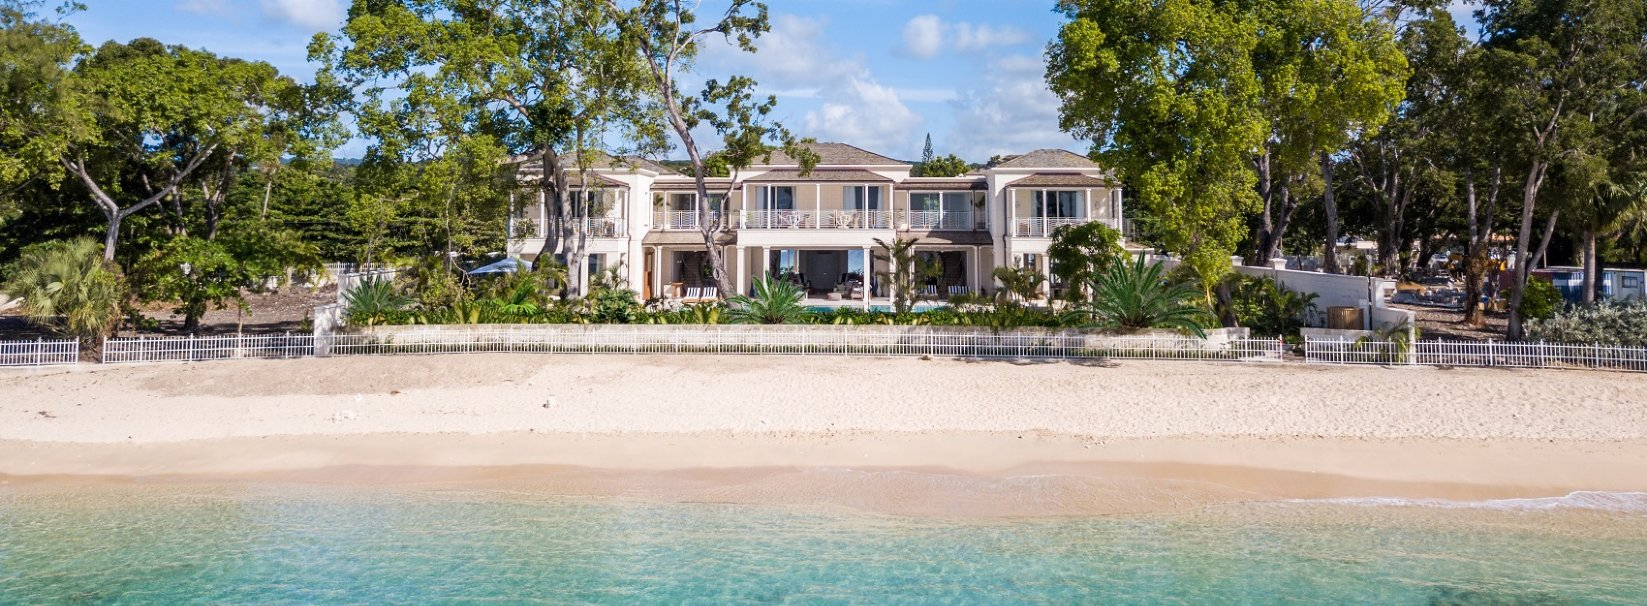 Beachlands, Holetown, St. James, Barbados